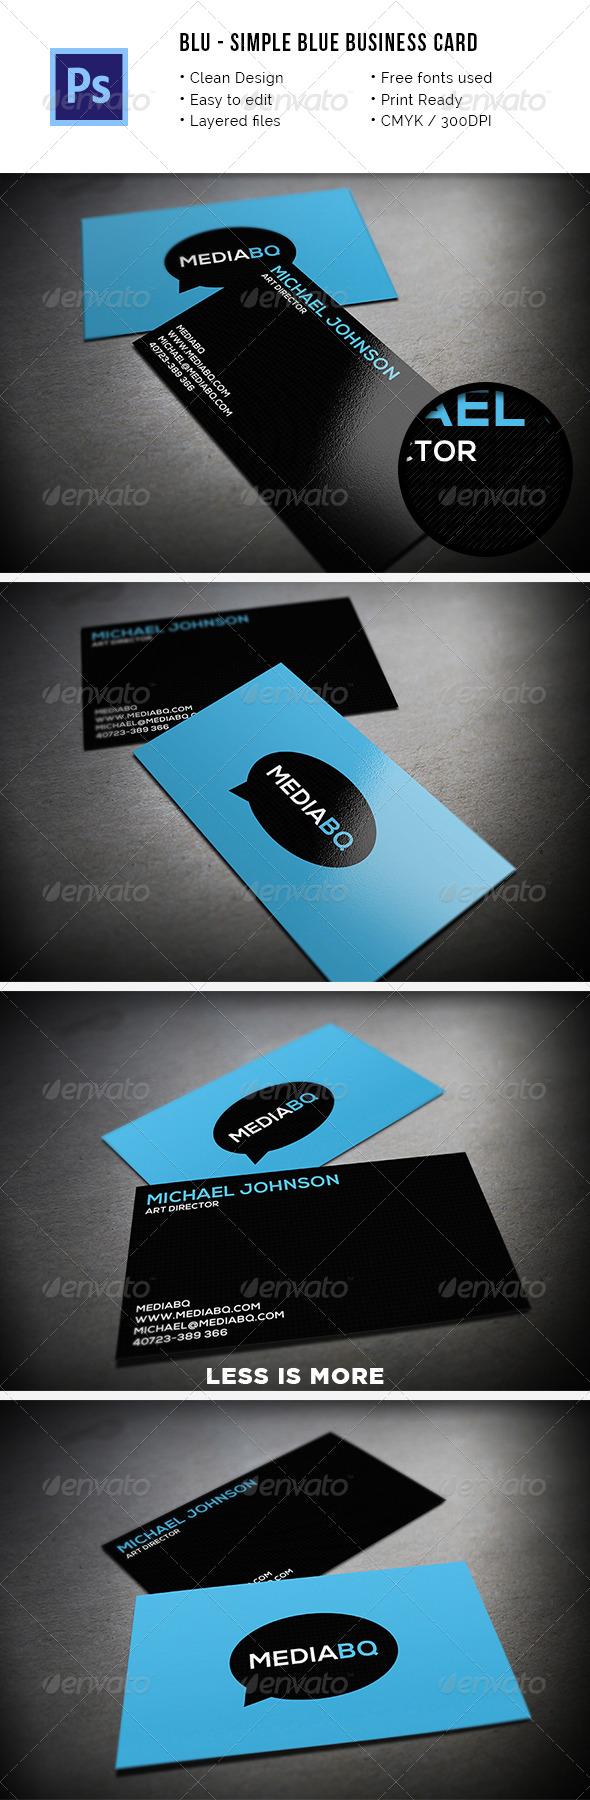 Blu - Simple Blue Business Card - Creative Business Cards